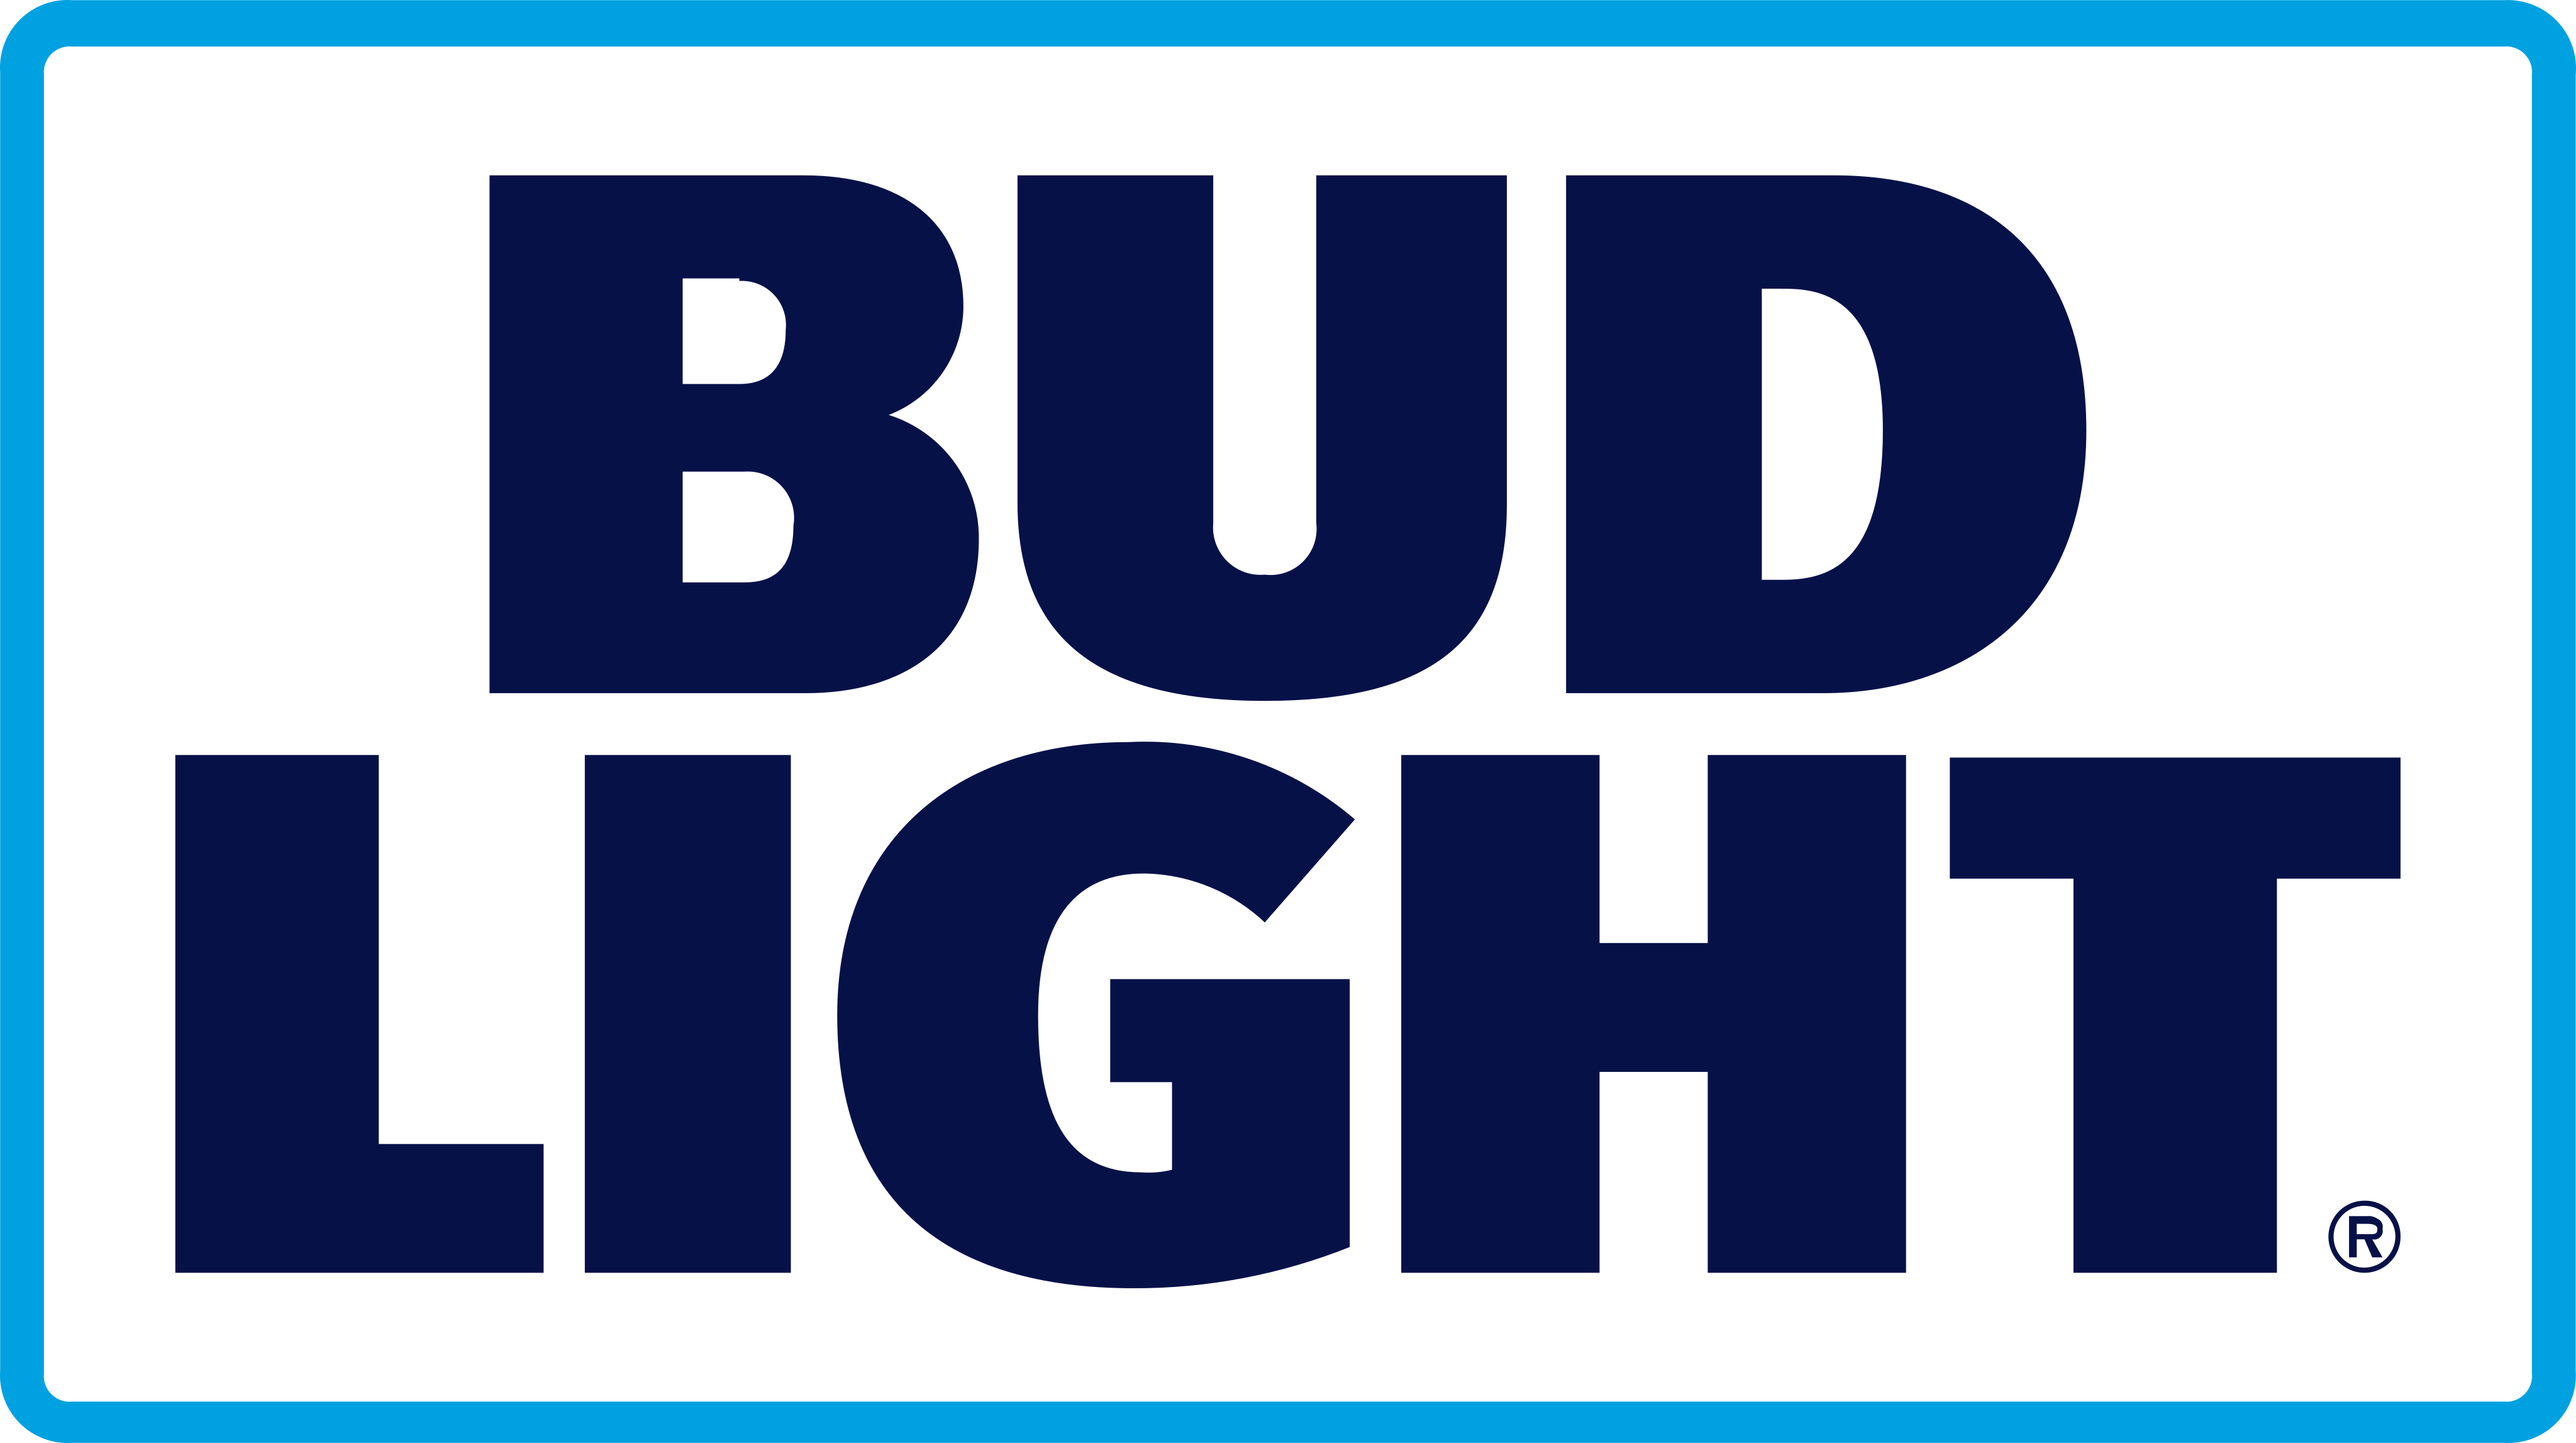 bud light logo - Bud Light Logo